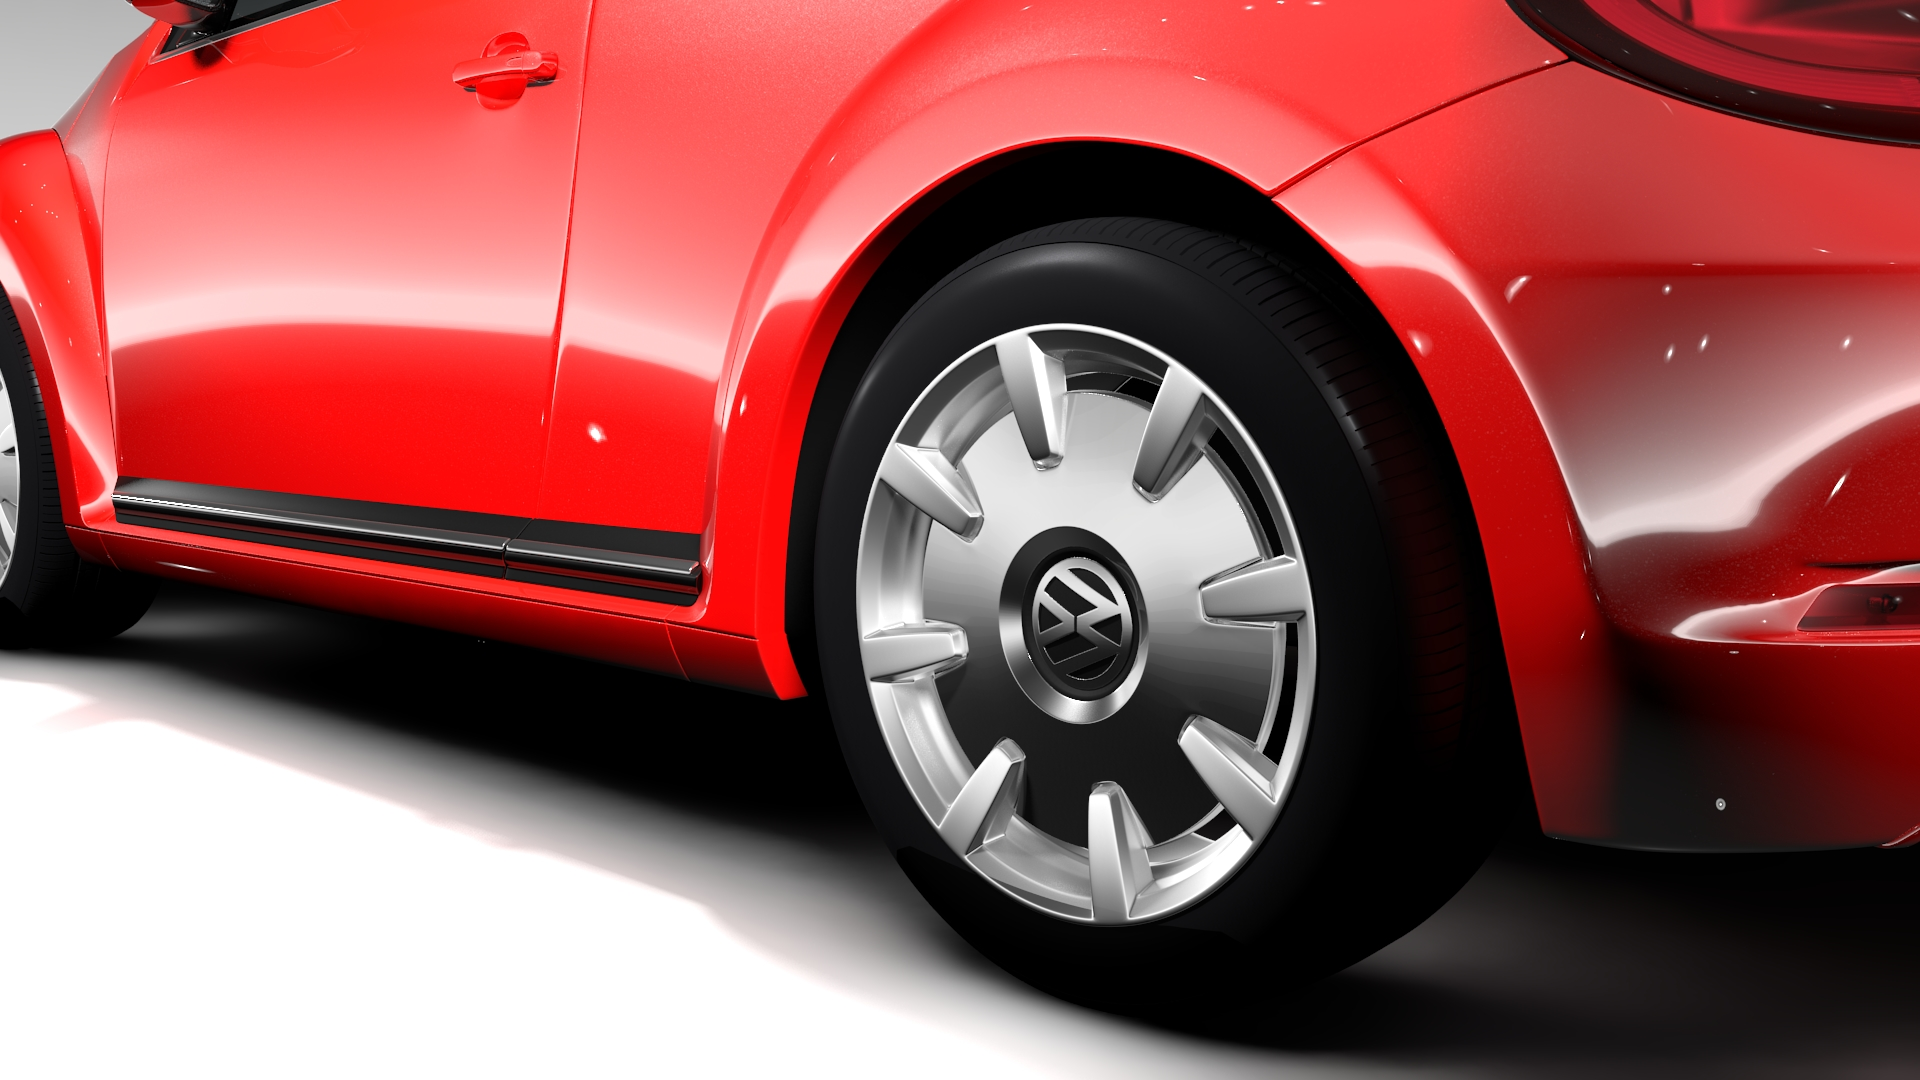 vw beetle turbo 2017 3d model 3ds max fbx c4d lwo ma mb hrc xsi obj 221664